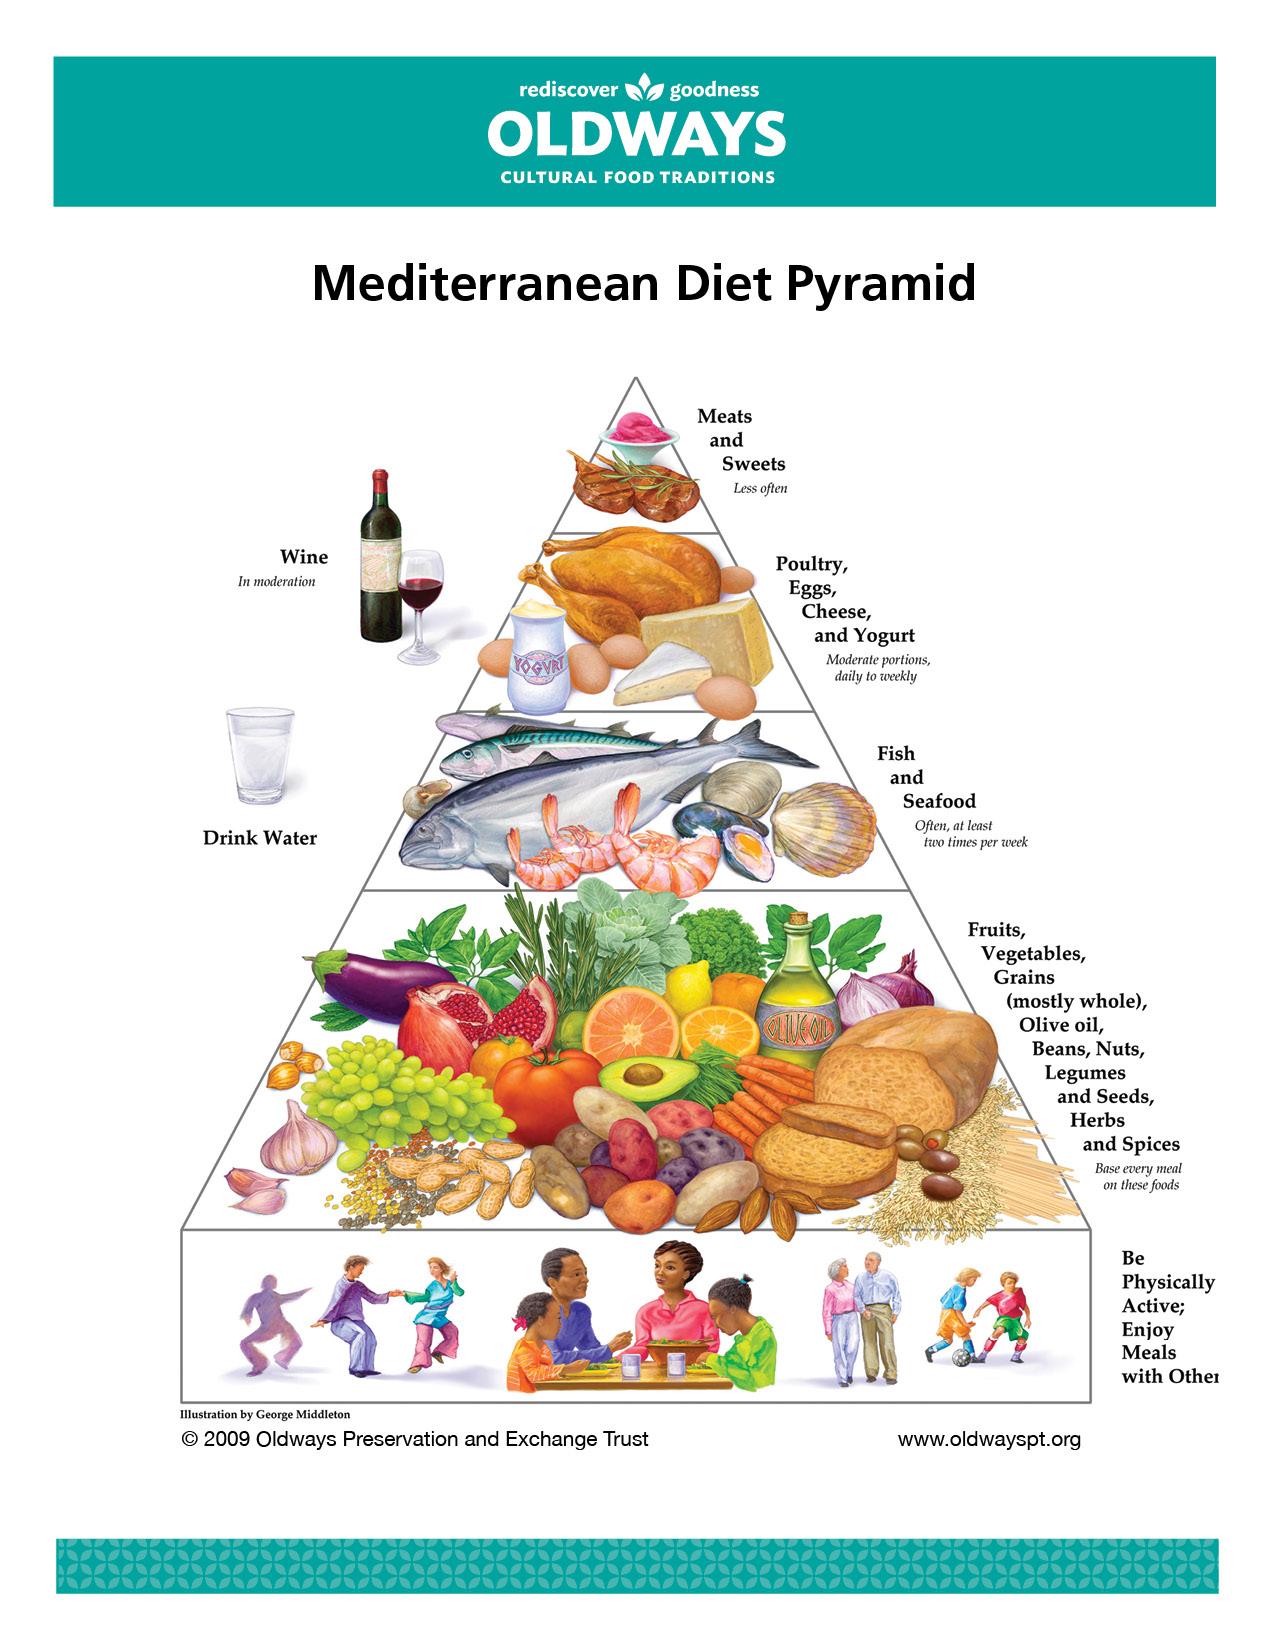 Mediterraneant